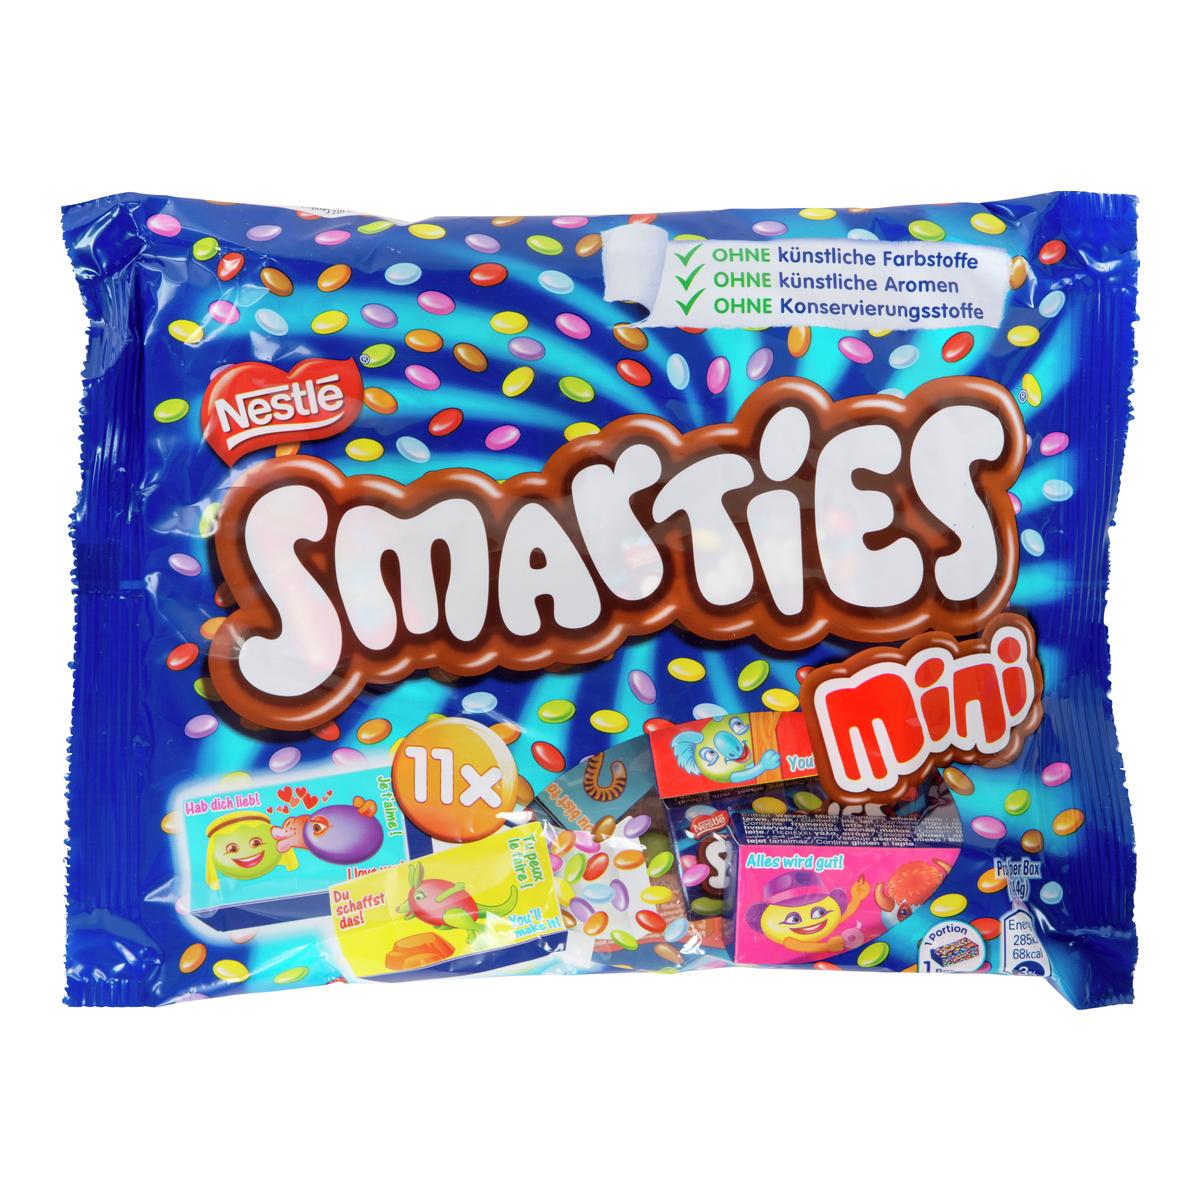 Smarties mini Nestlè 158g - POSER/ESKER - Nille Smarties Mini